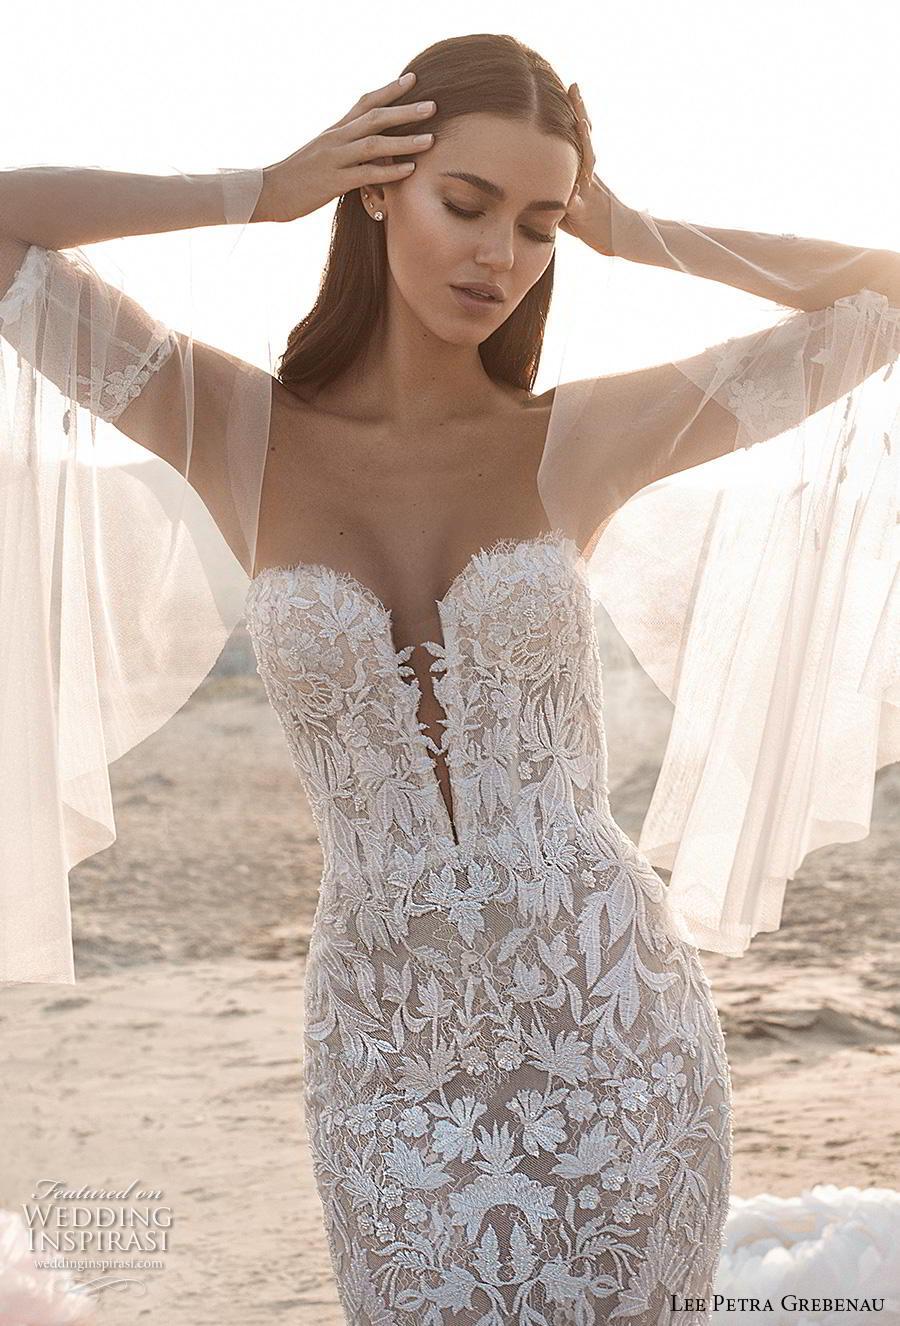 lee petra grebenau fall 2019 bridal deep plunging sweetheart neckline full embellishment sexy romantic fit and flare sheath wedding dress mid back short train (2) zv